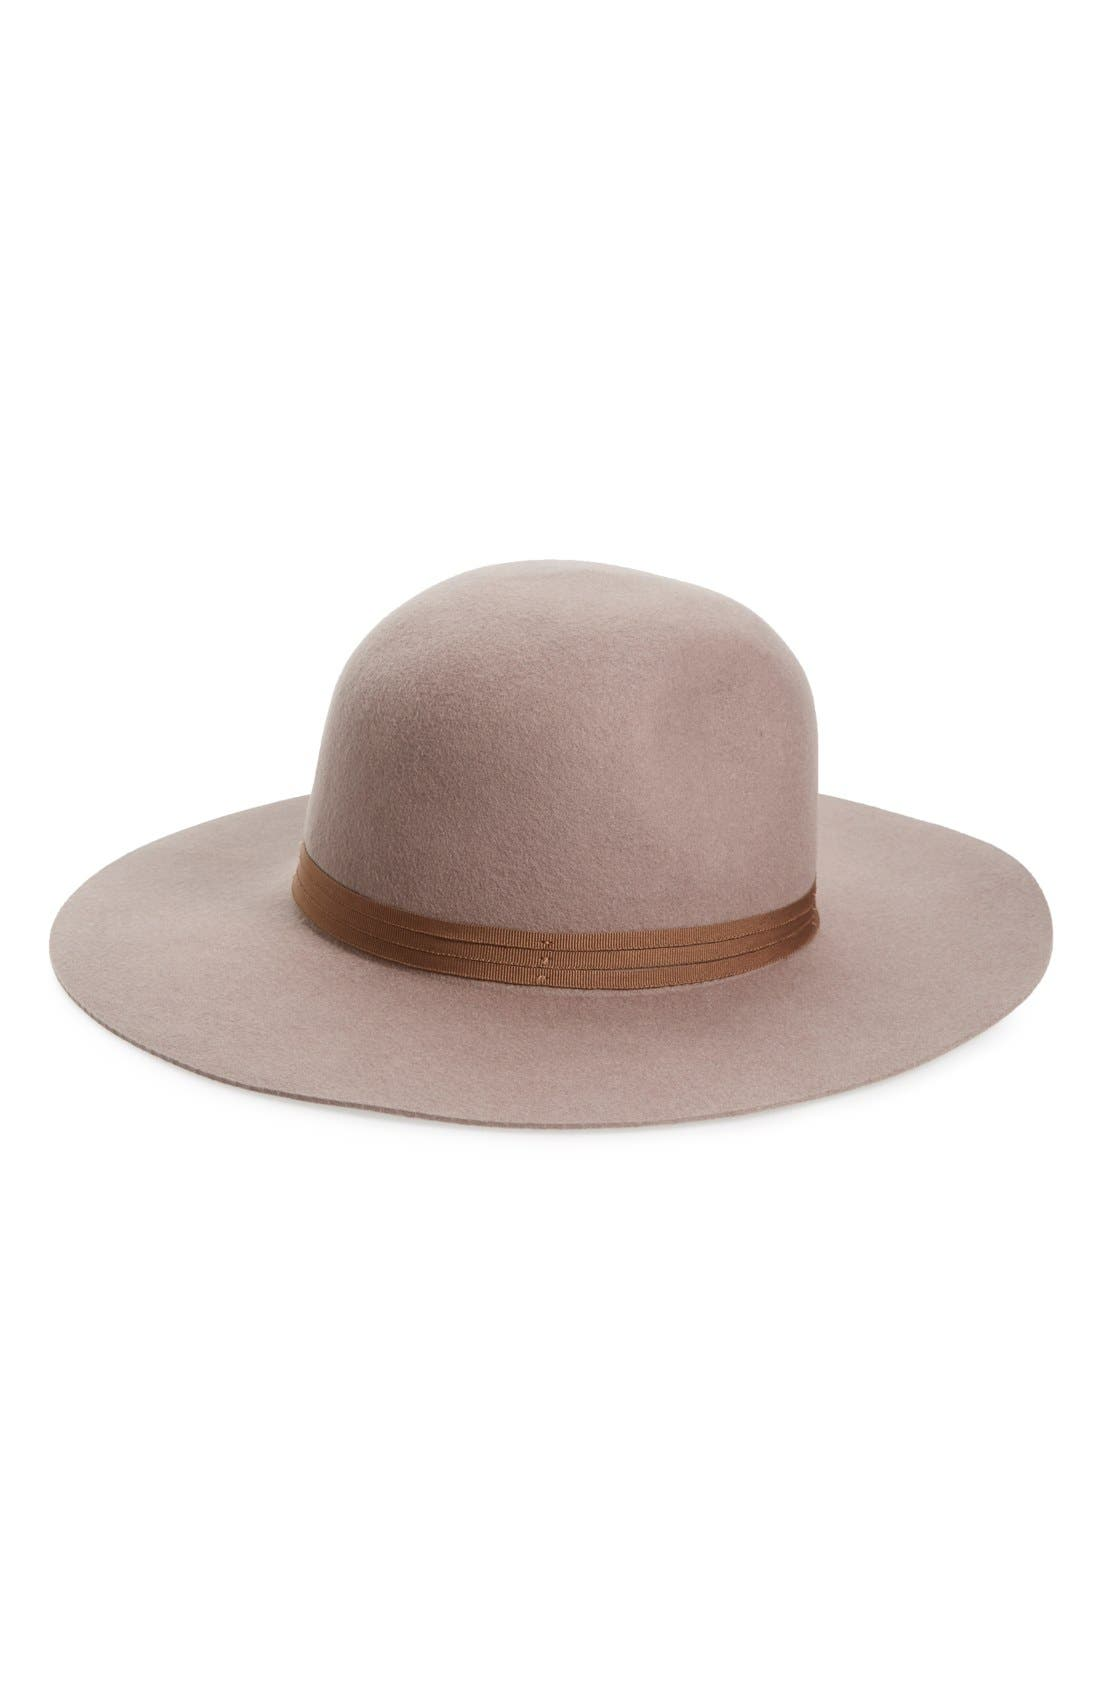 'Magdalena' Wide Brim Wool Felt Hat,                             Main thumbnail 1, color,                             250